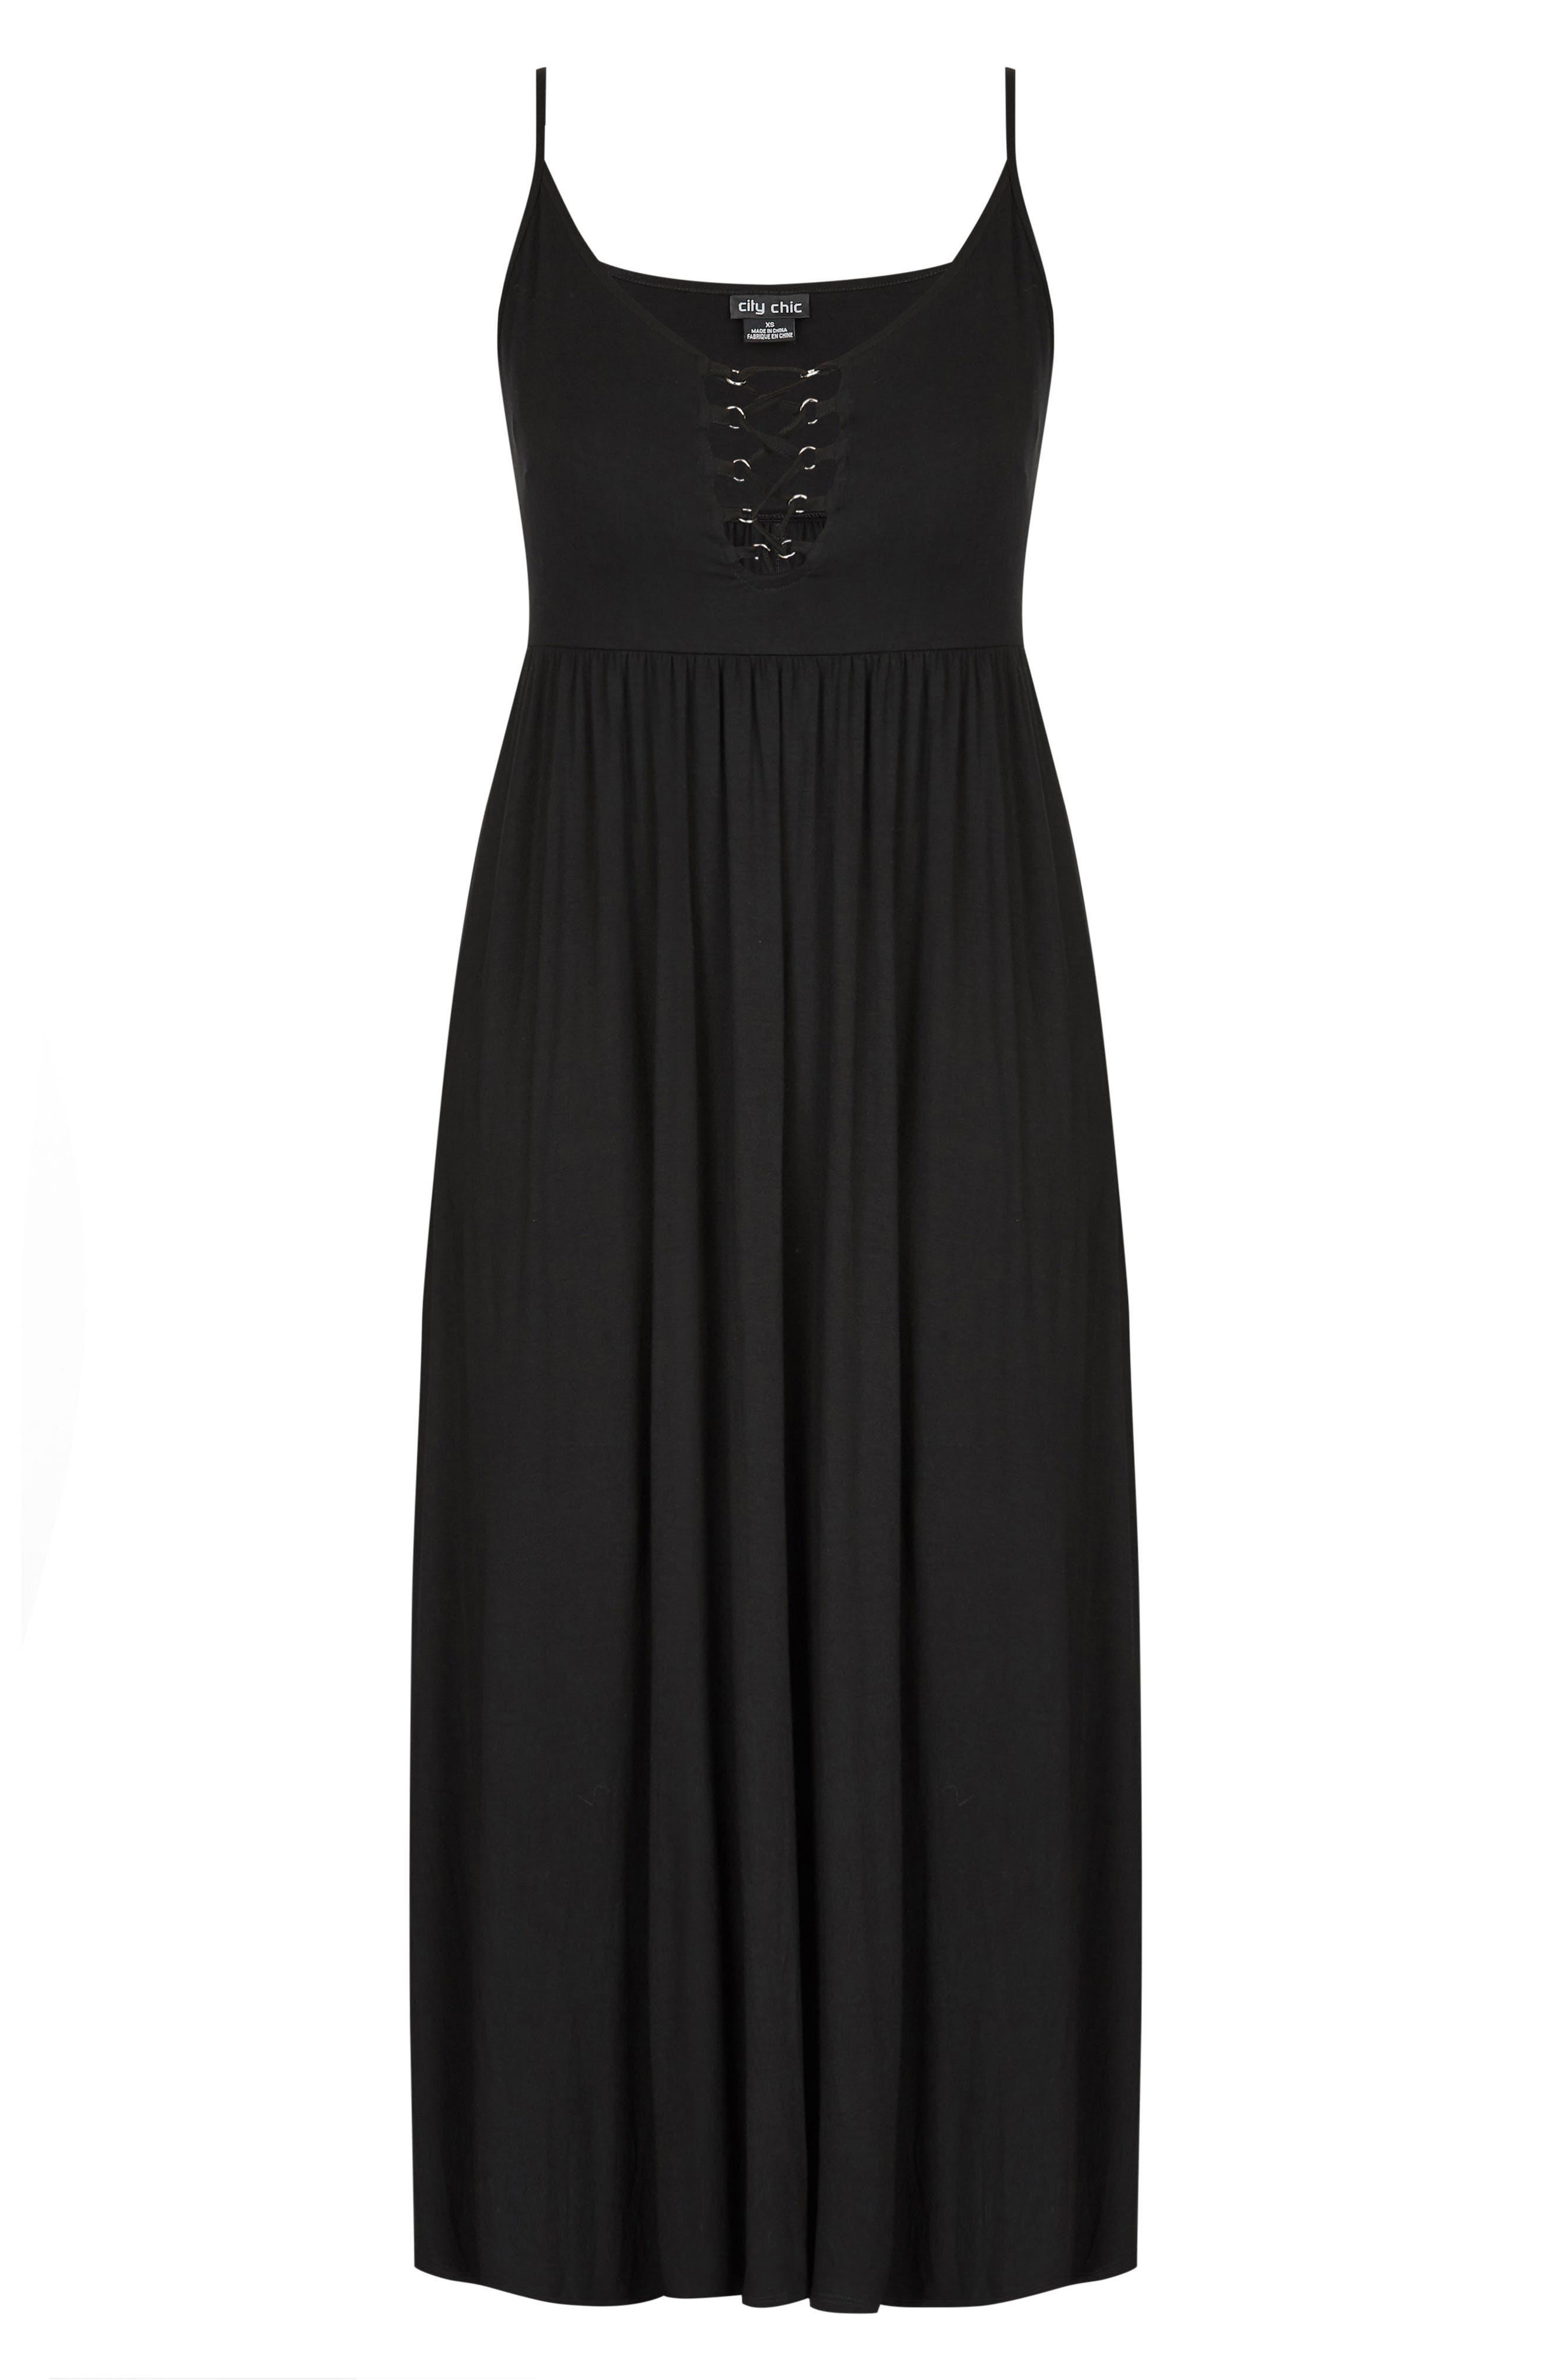 Lace Up Maxi Dress,                             Alternate thumbnail 3, color,                             Black